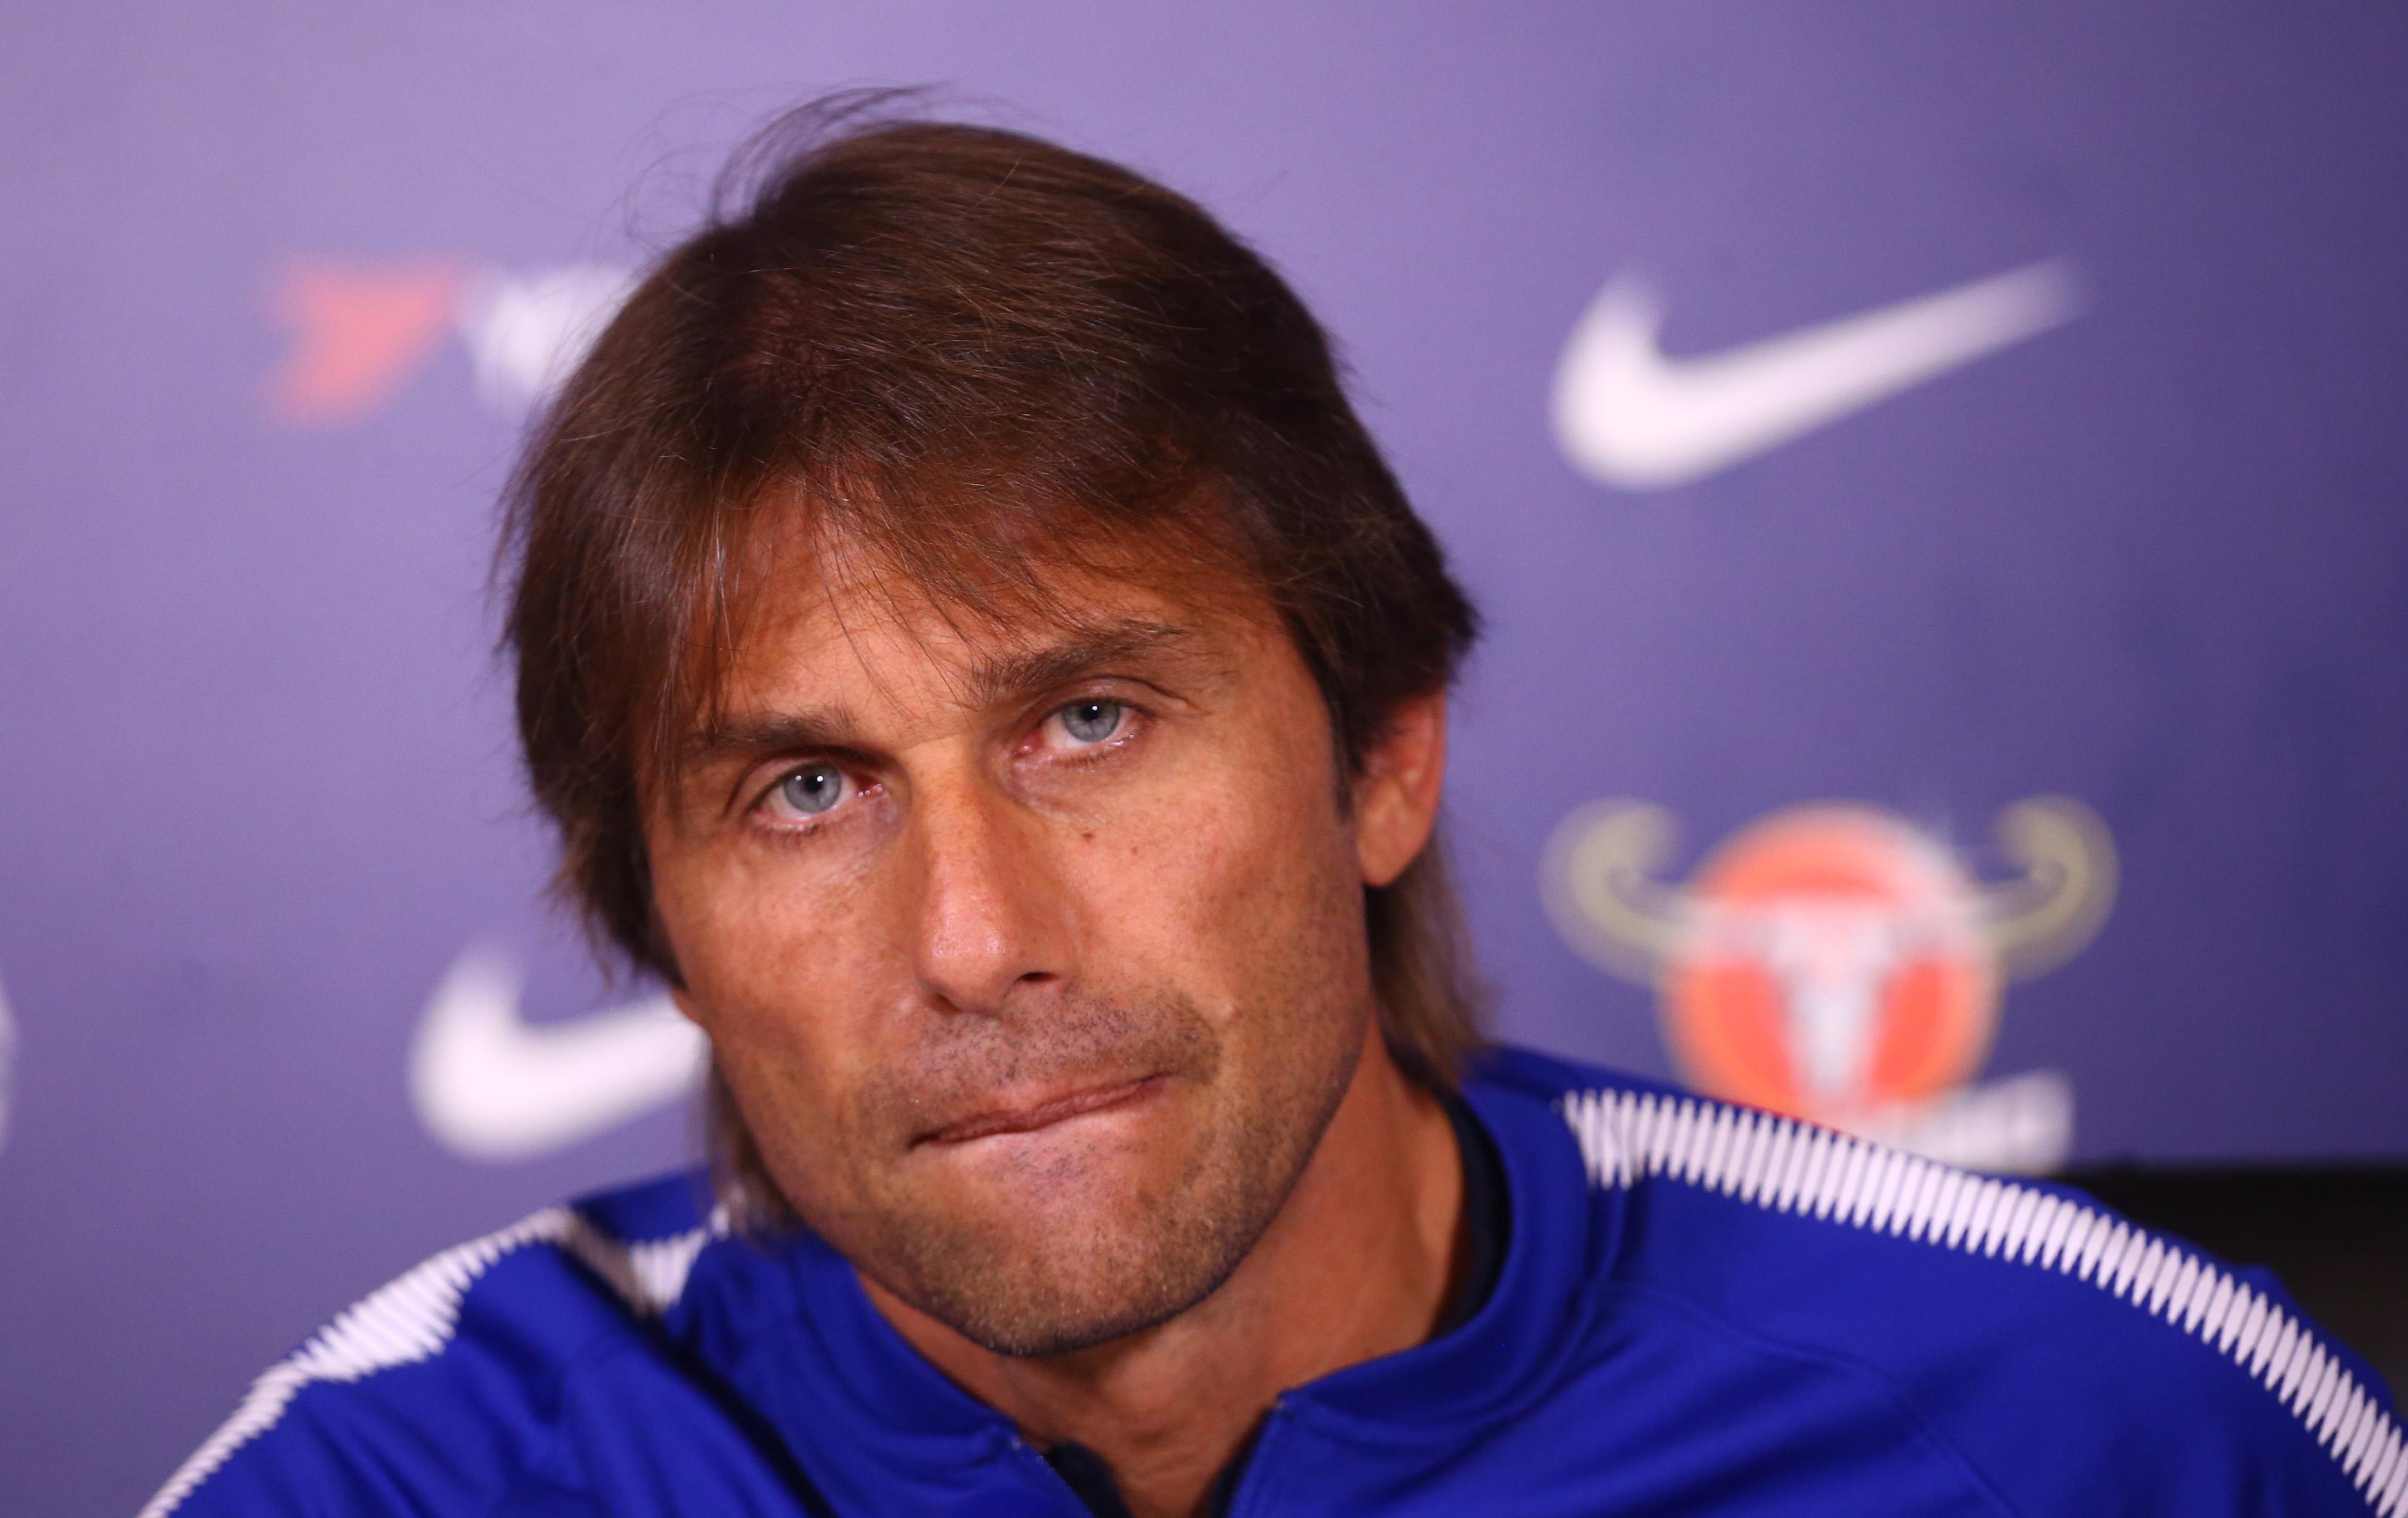 Chelsea ready to battle Barcelona for Bayer Leverkusen midfielder Atakan Akkaynak